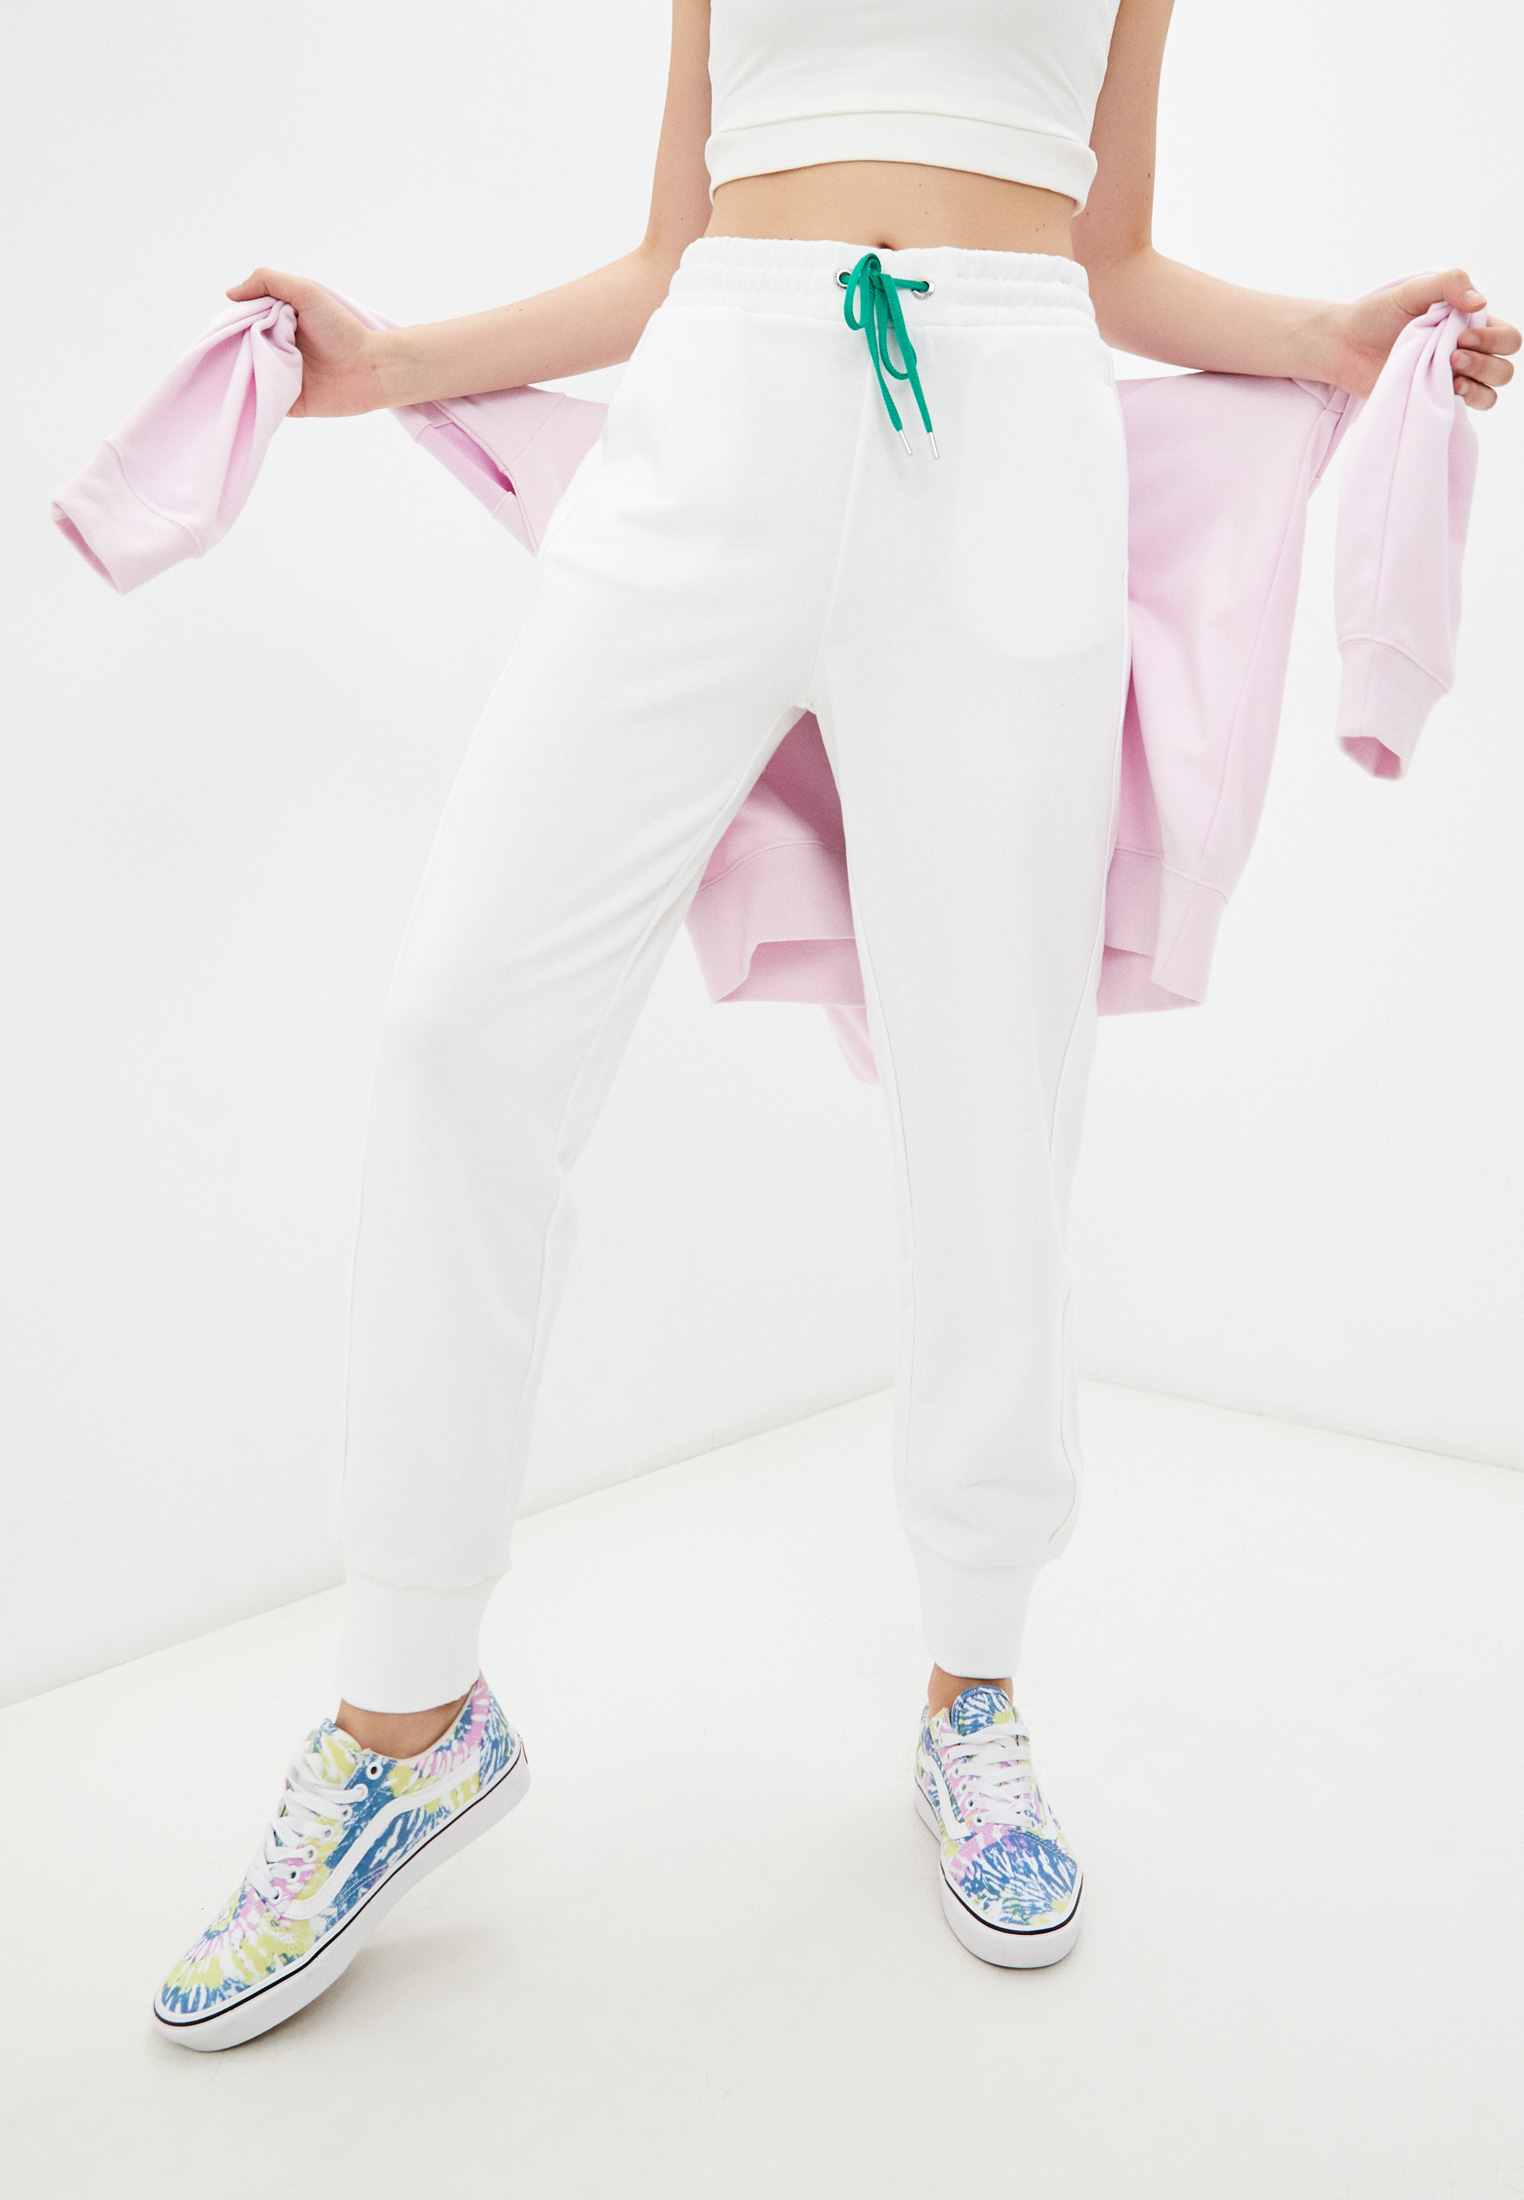 Женские спортивные брюки United Colors of Benetton (Юнайтед Колорс оф Бенеттон) Брюки спортивные United Colors of Benetton